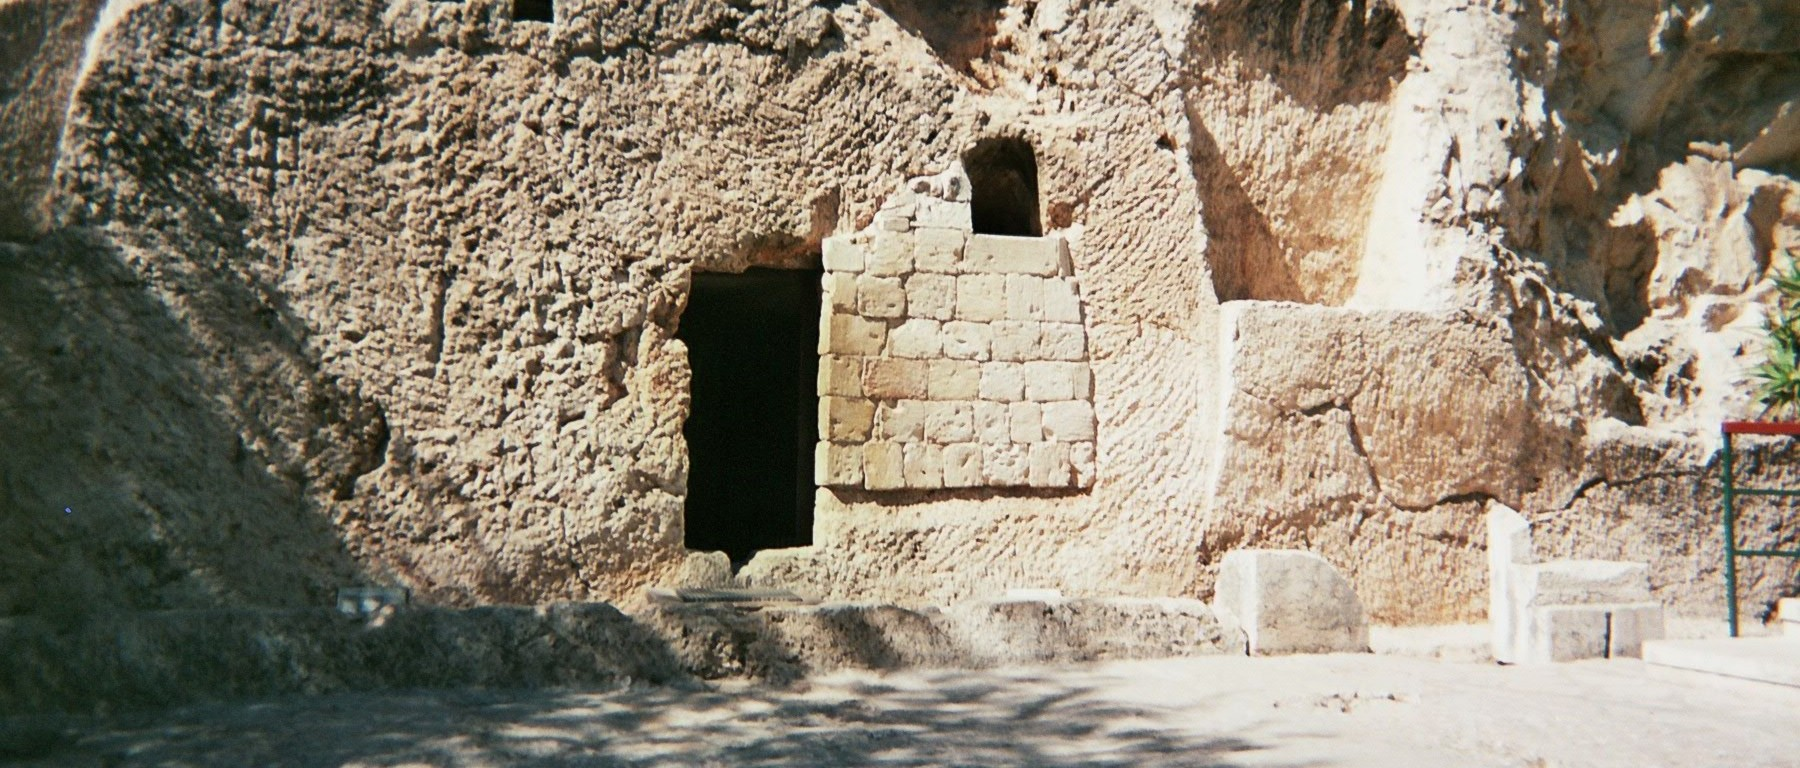 resurrection empy tomb Jesus Christ Christianity raised